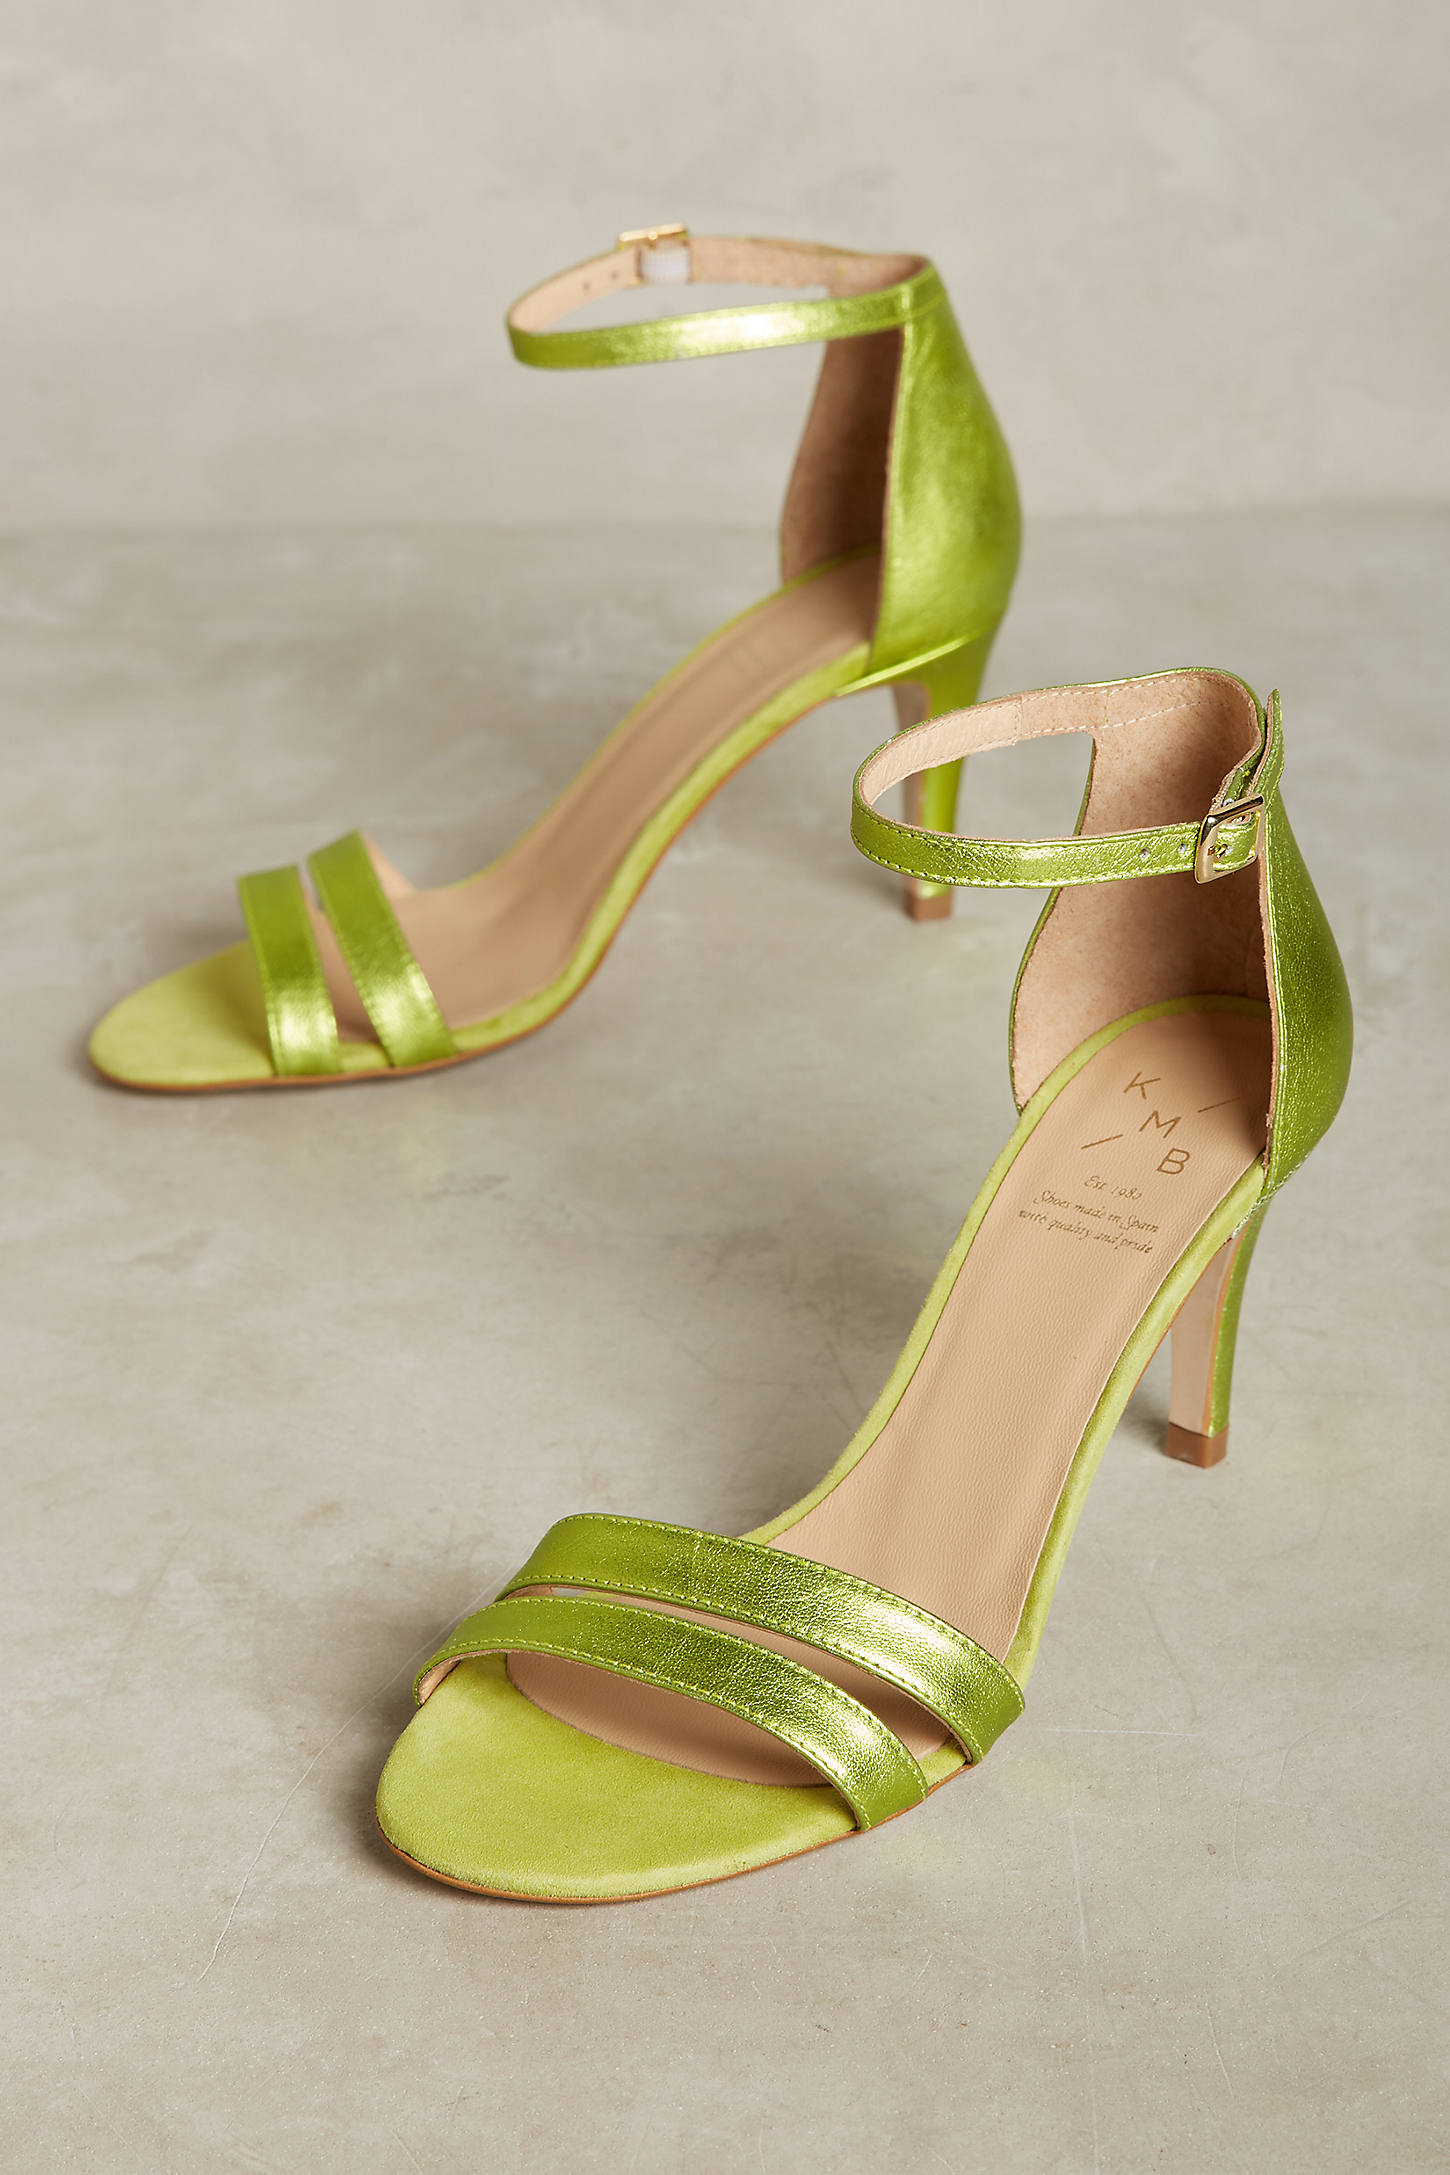 KMB Metallic Lime Heeled Sandals